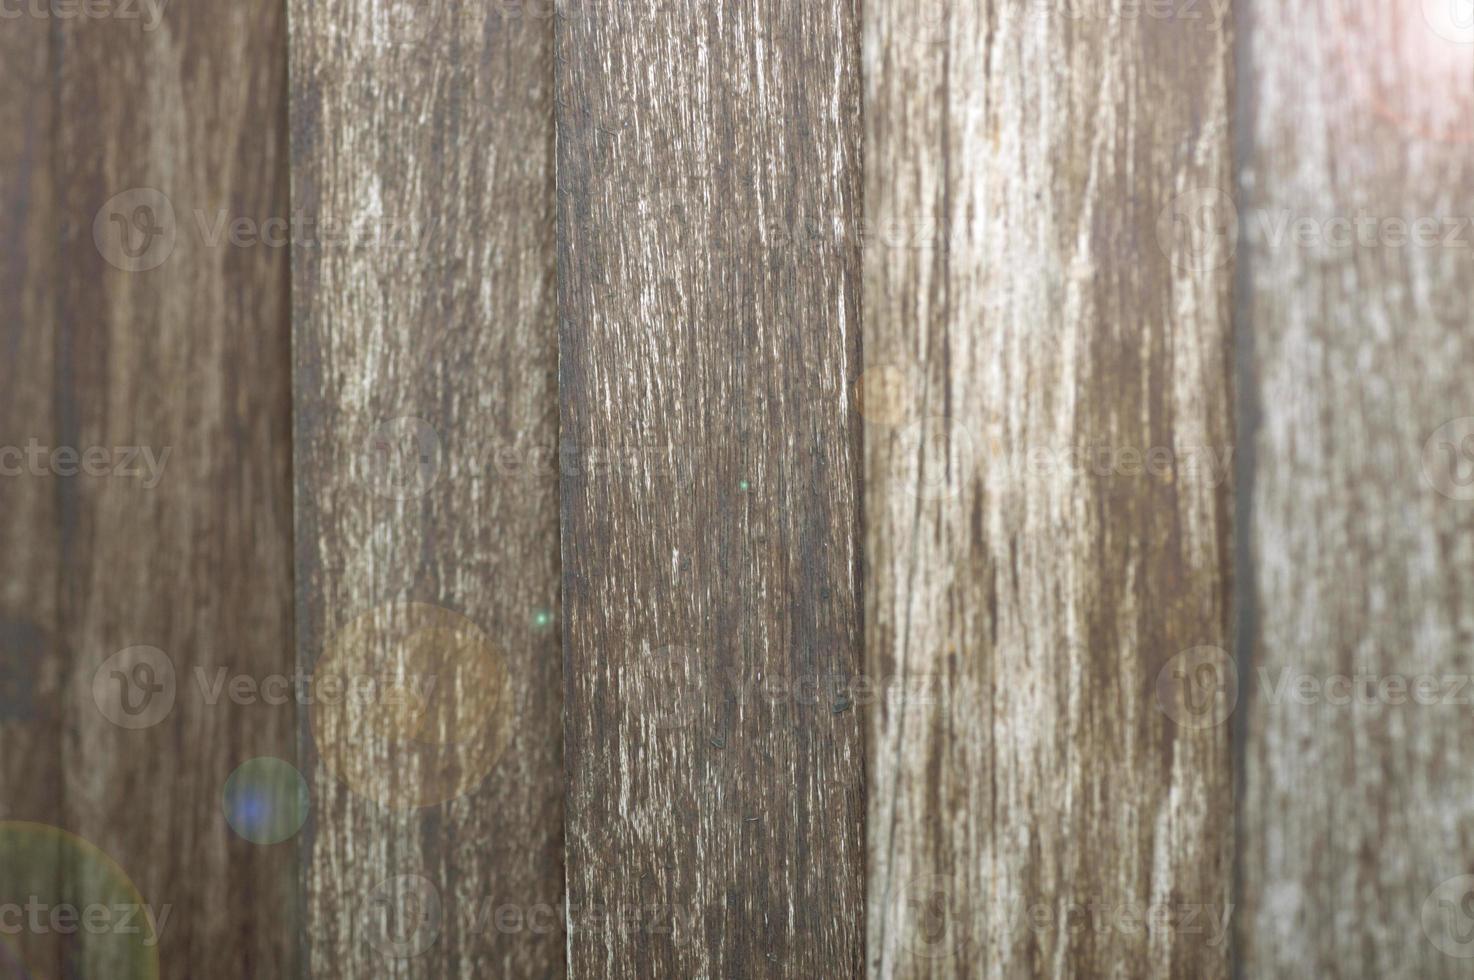 textura de madera. paneles antiguos de fondo foto